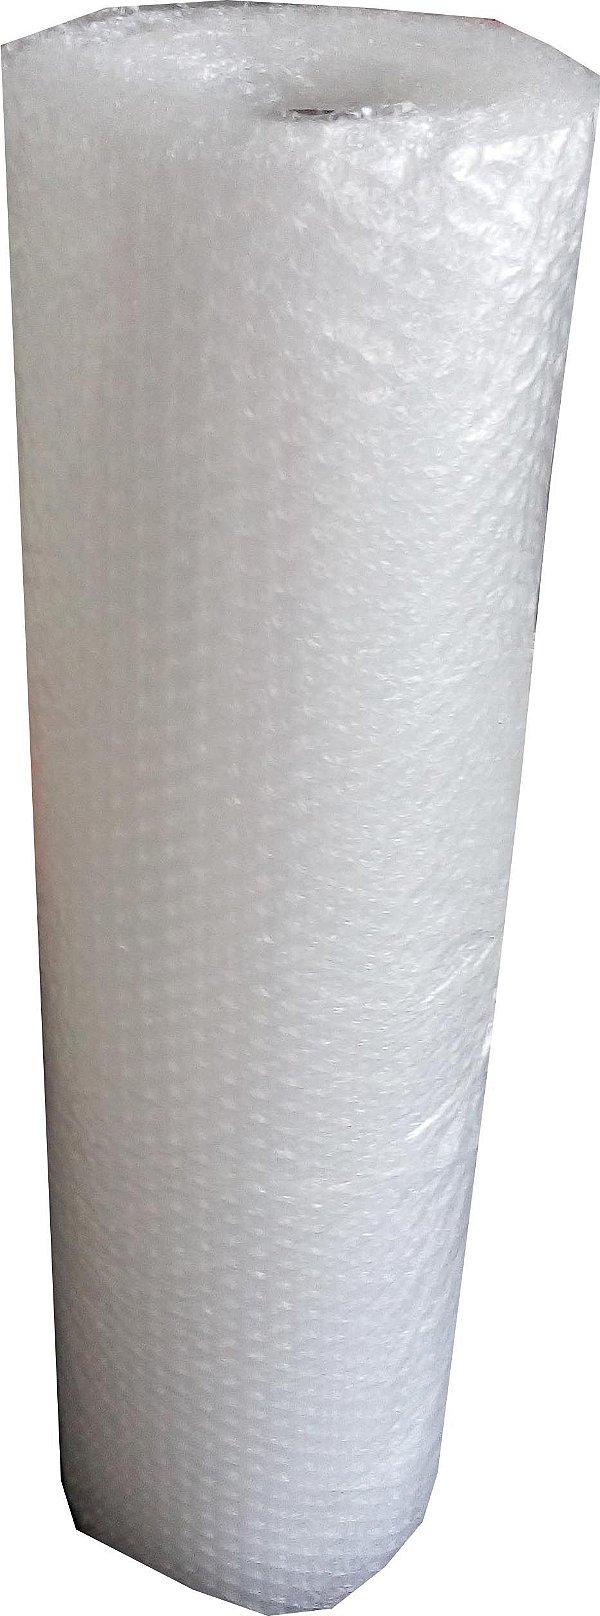 Plástico Bolha 60cm x 10m - Pct c/4